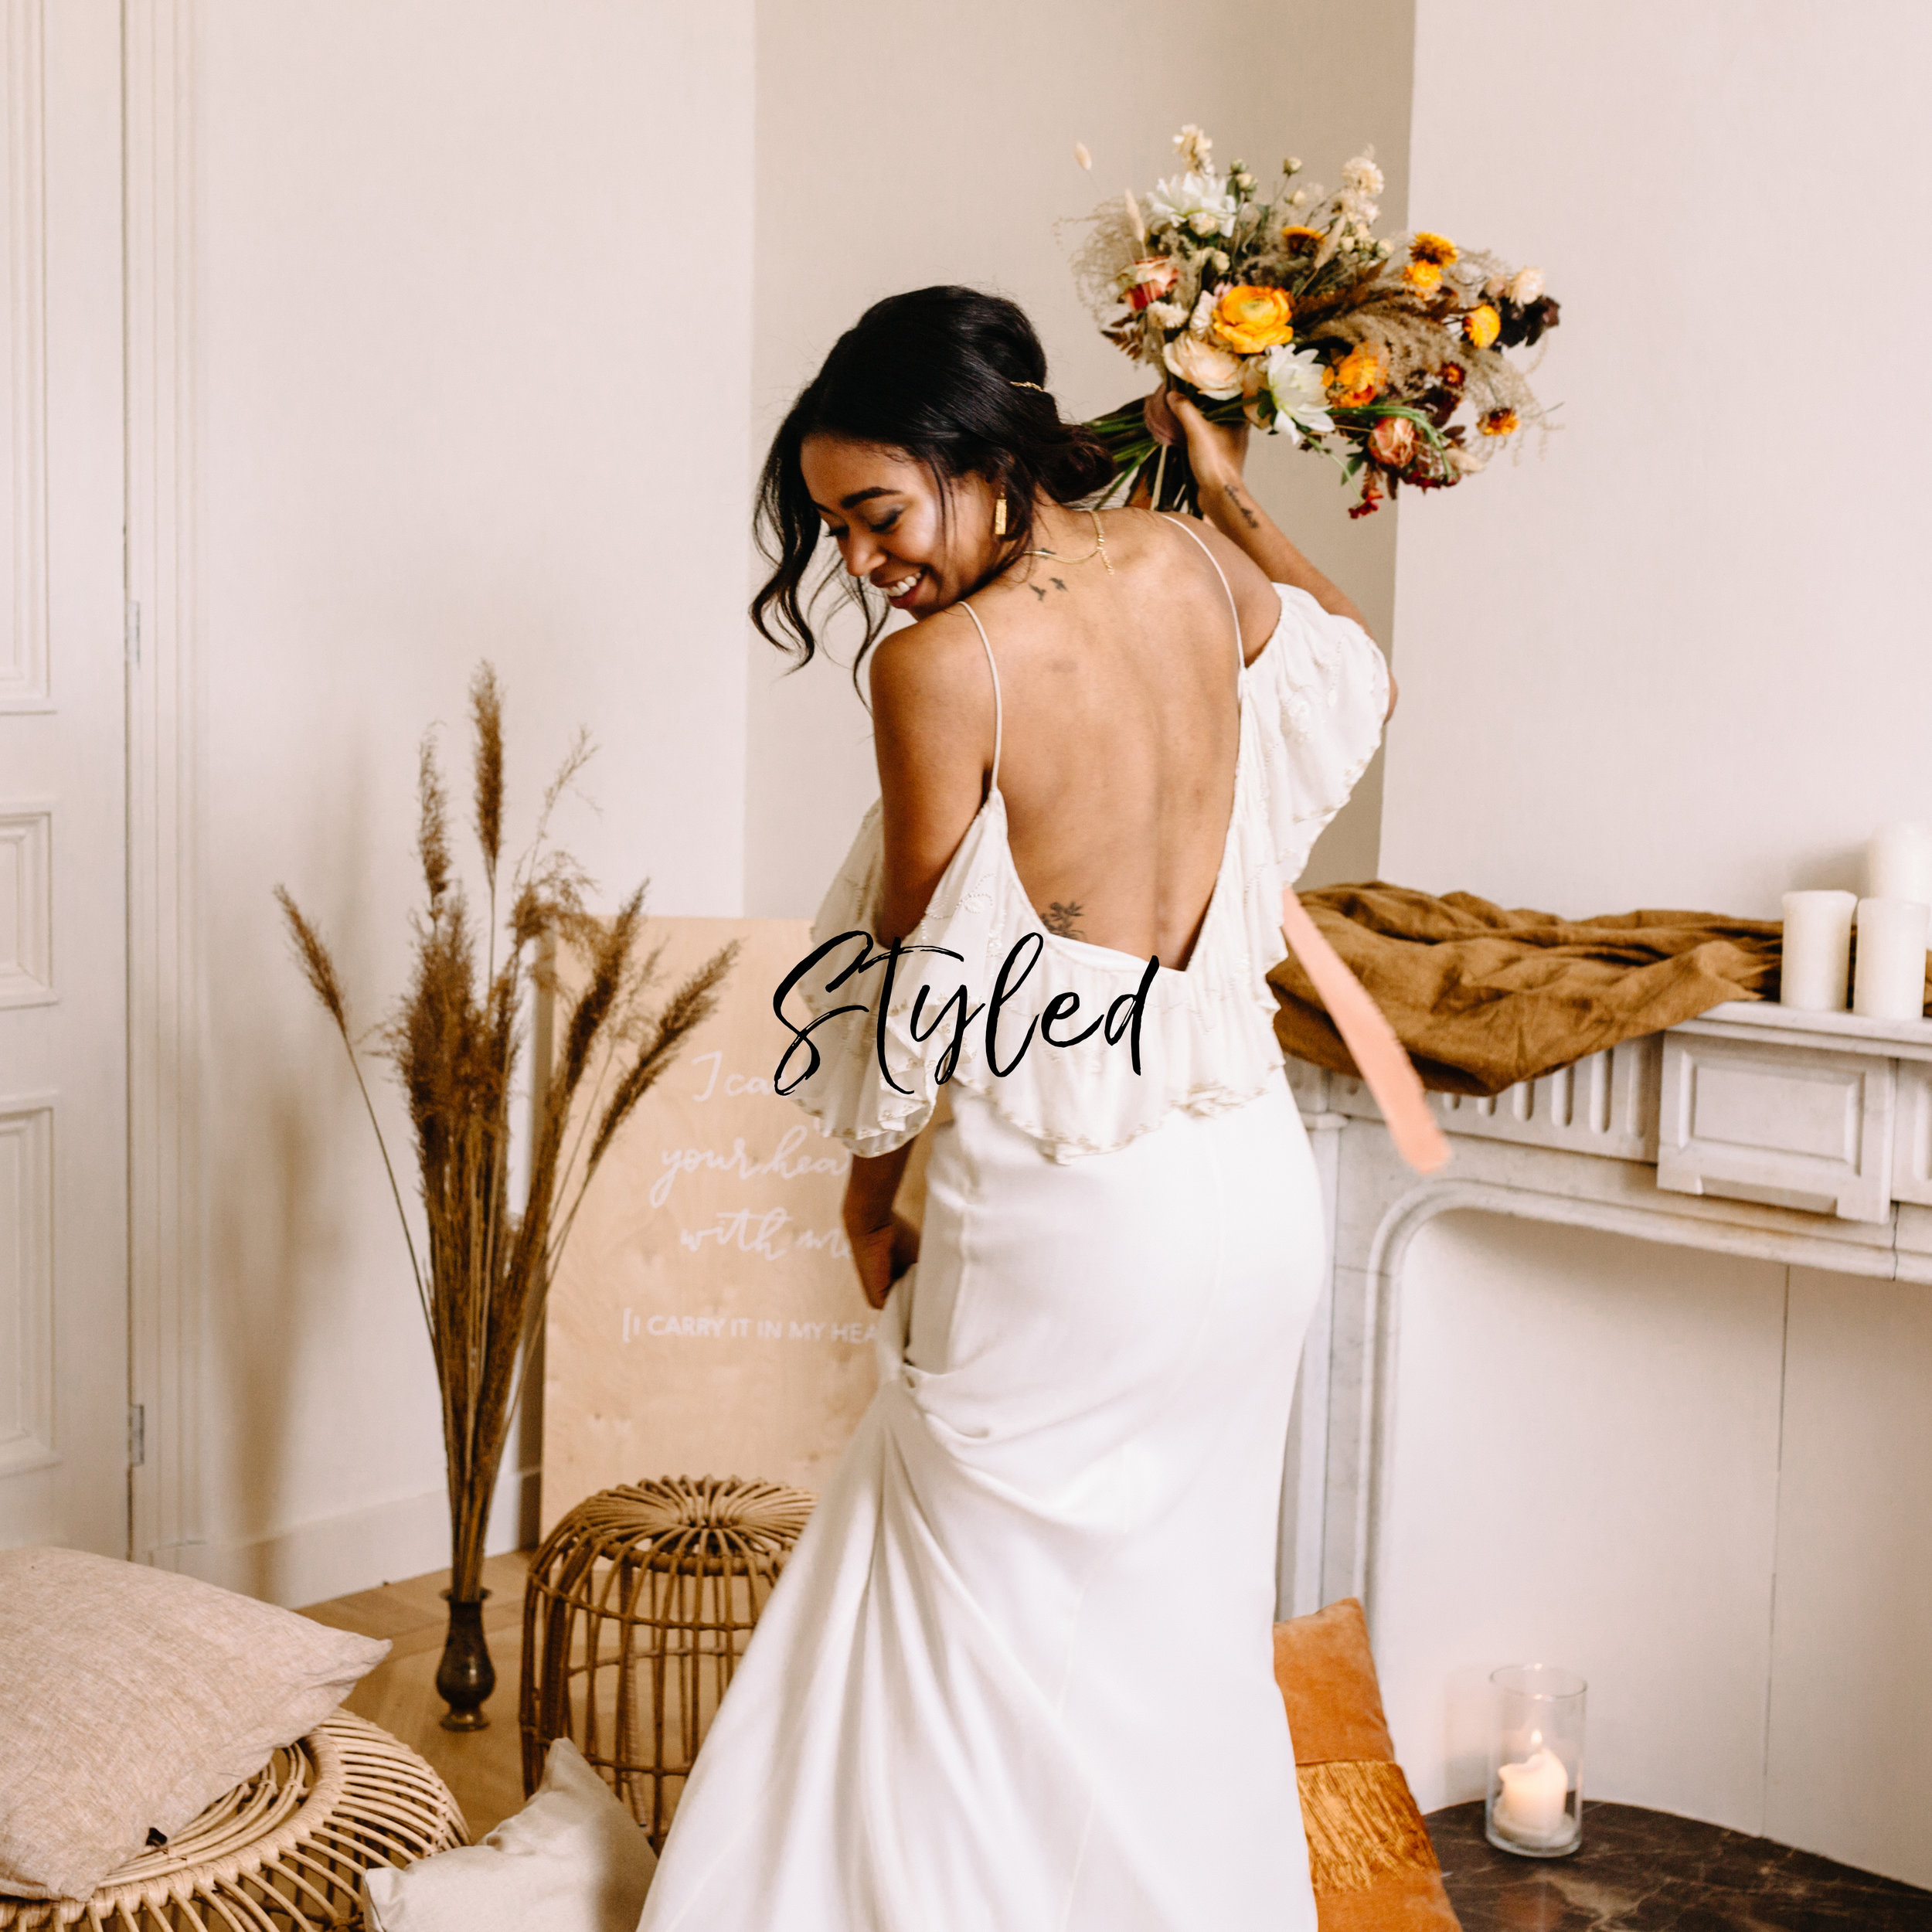 styled-shoot-salon-weddings-lisa-helsen-photography-herentals-kempen-westerlo-bohemian-boho-huwelijk-wildflowers-and-wodka